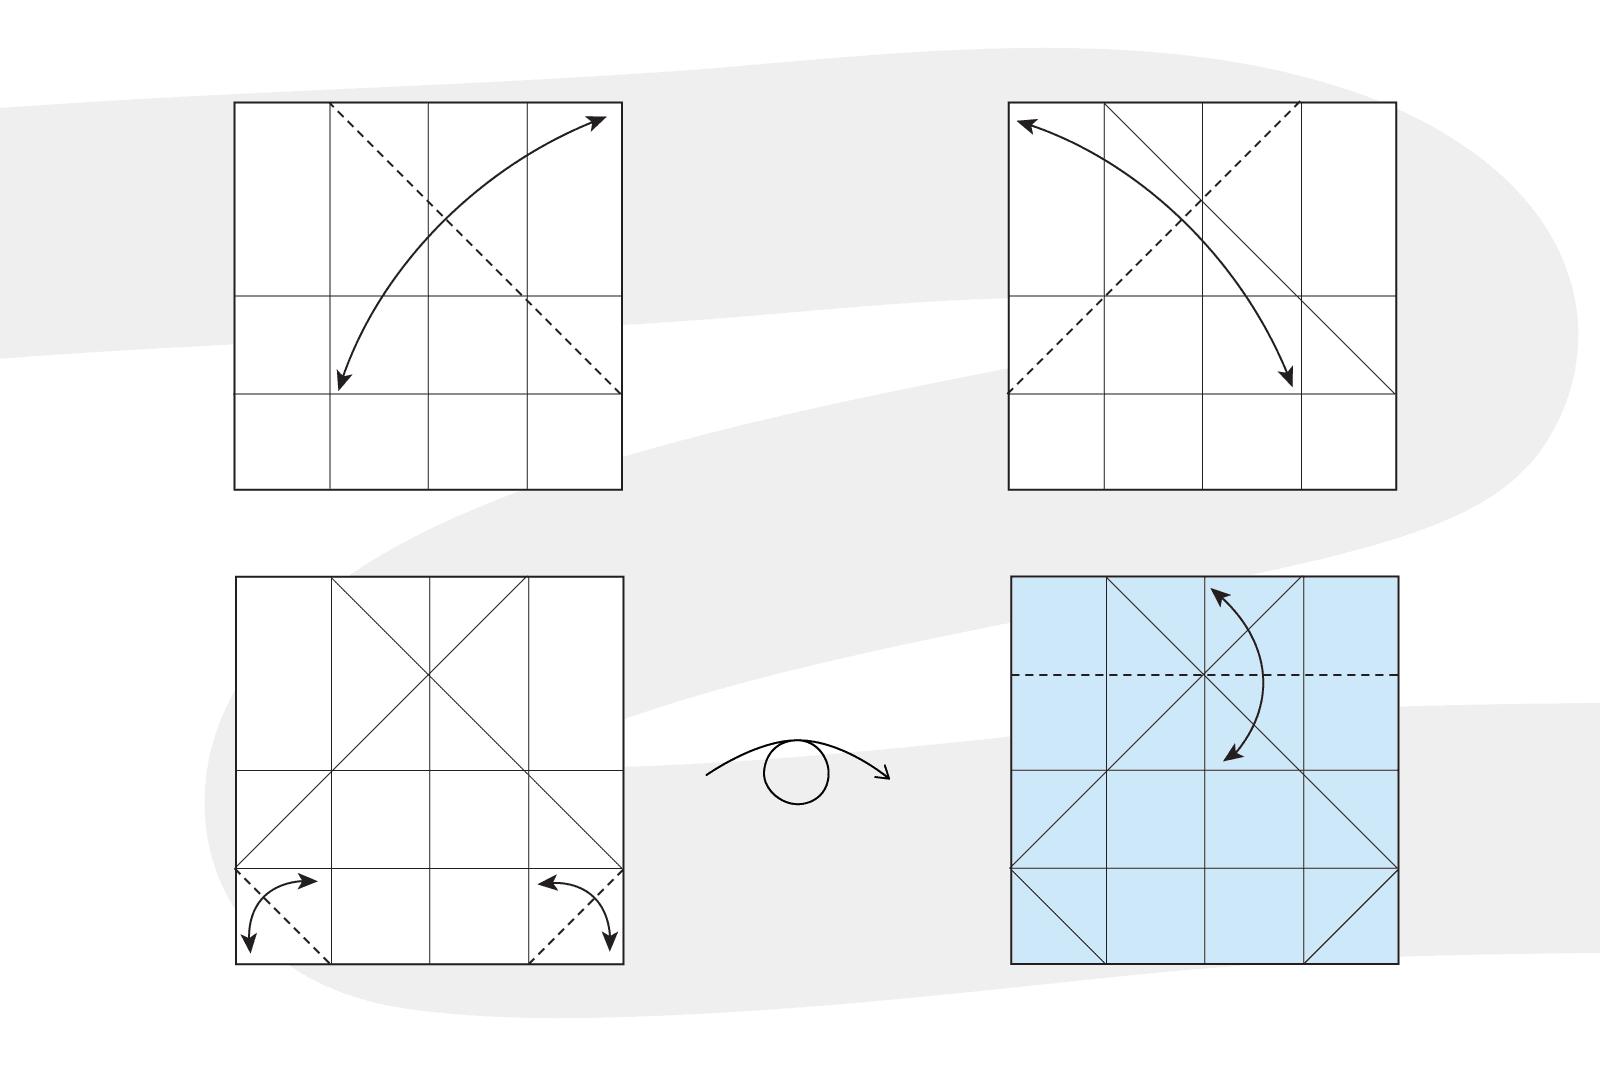 origami house 3d 28 images unit origami diagrams unit